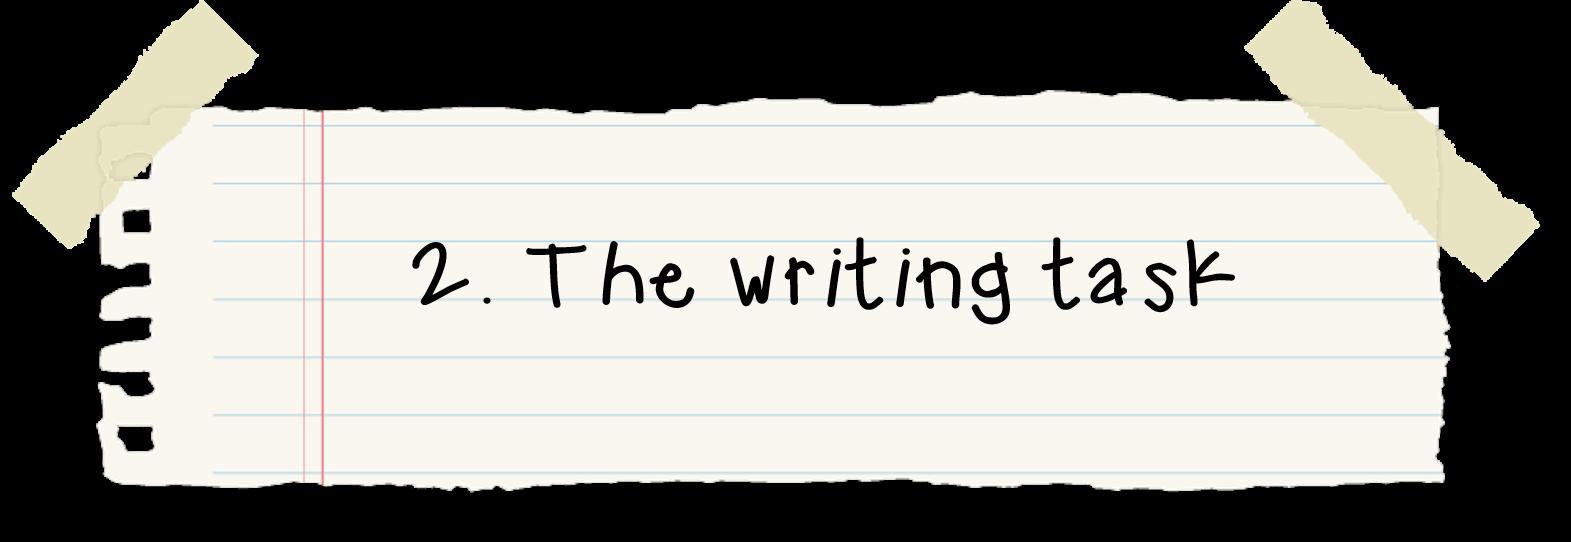 persuasive writing homework task